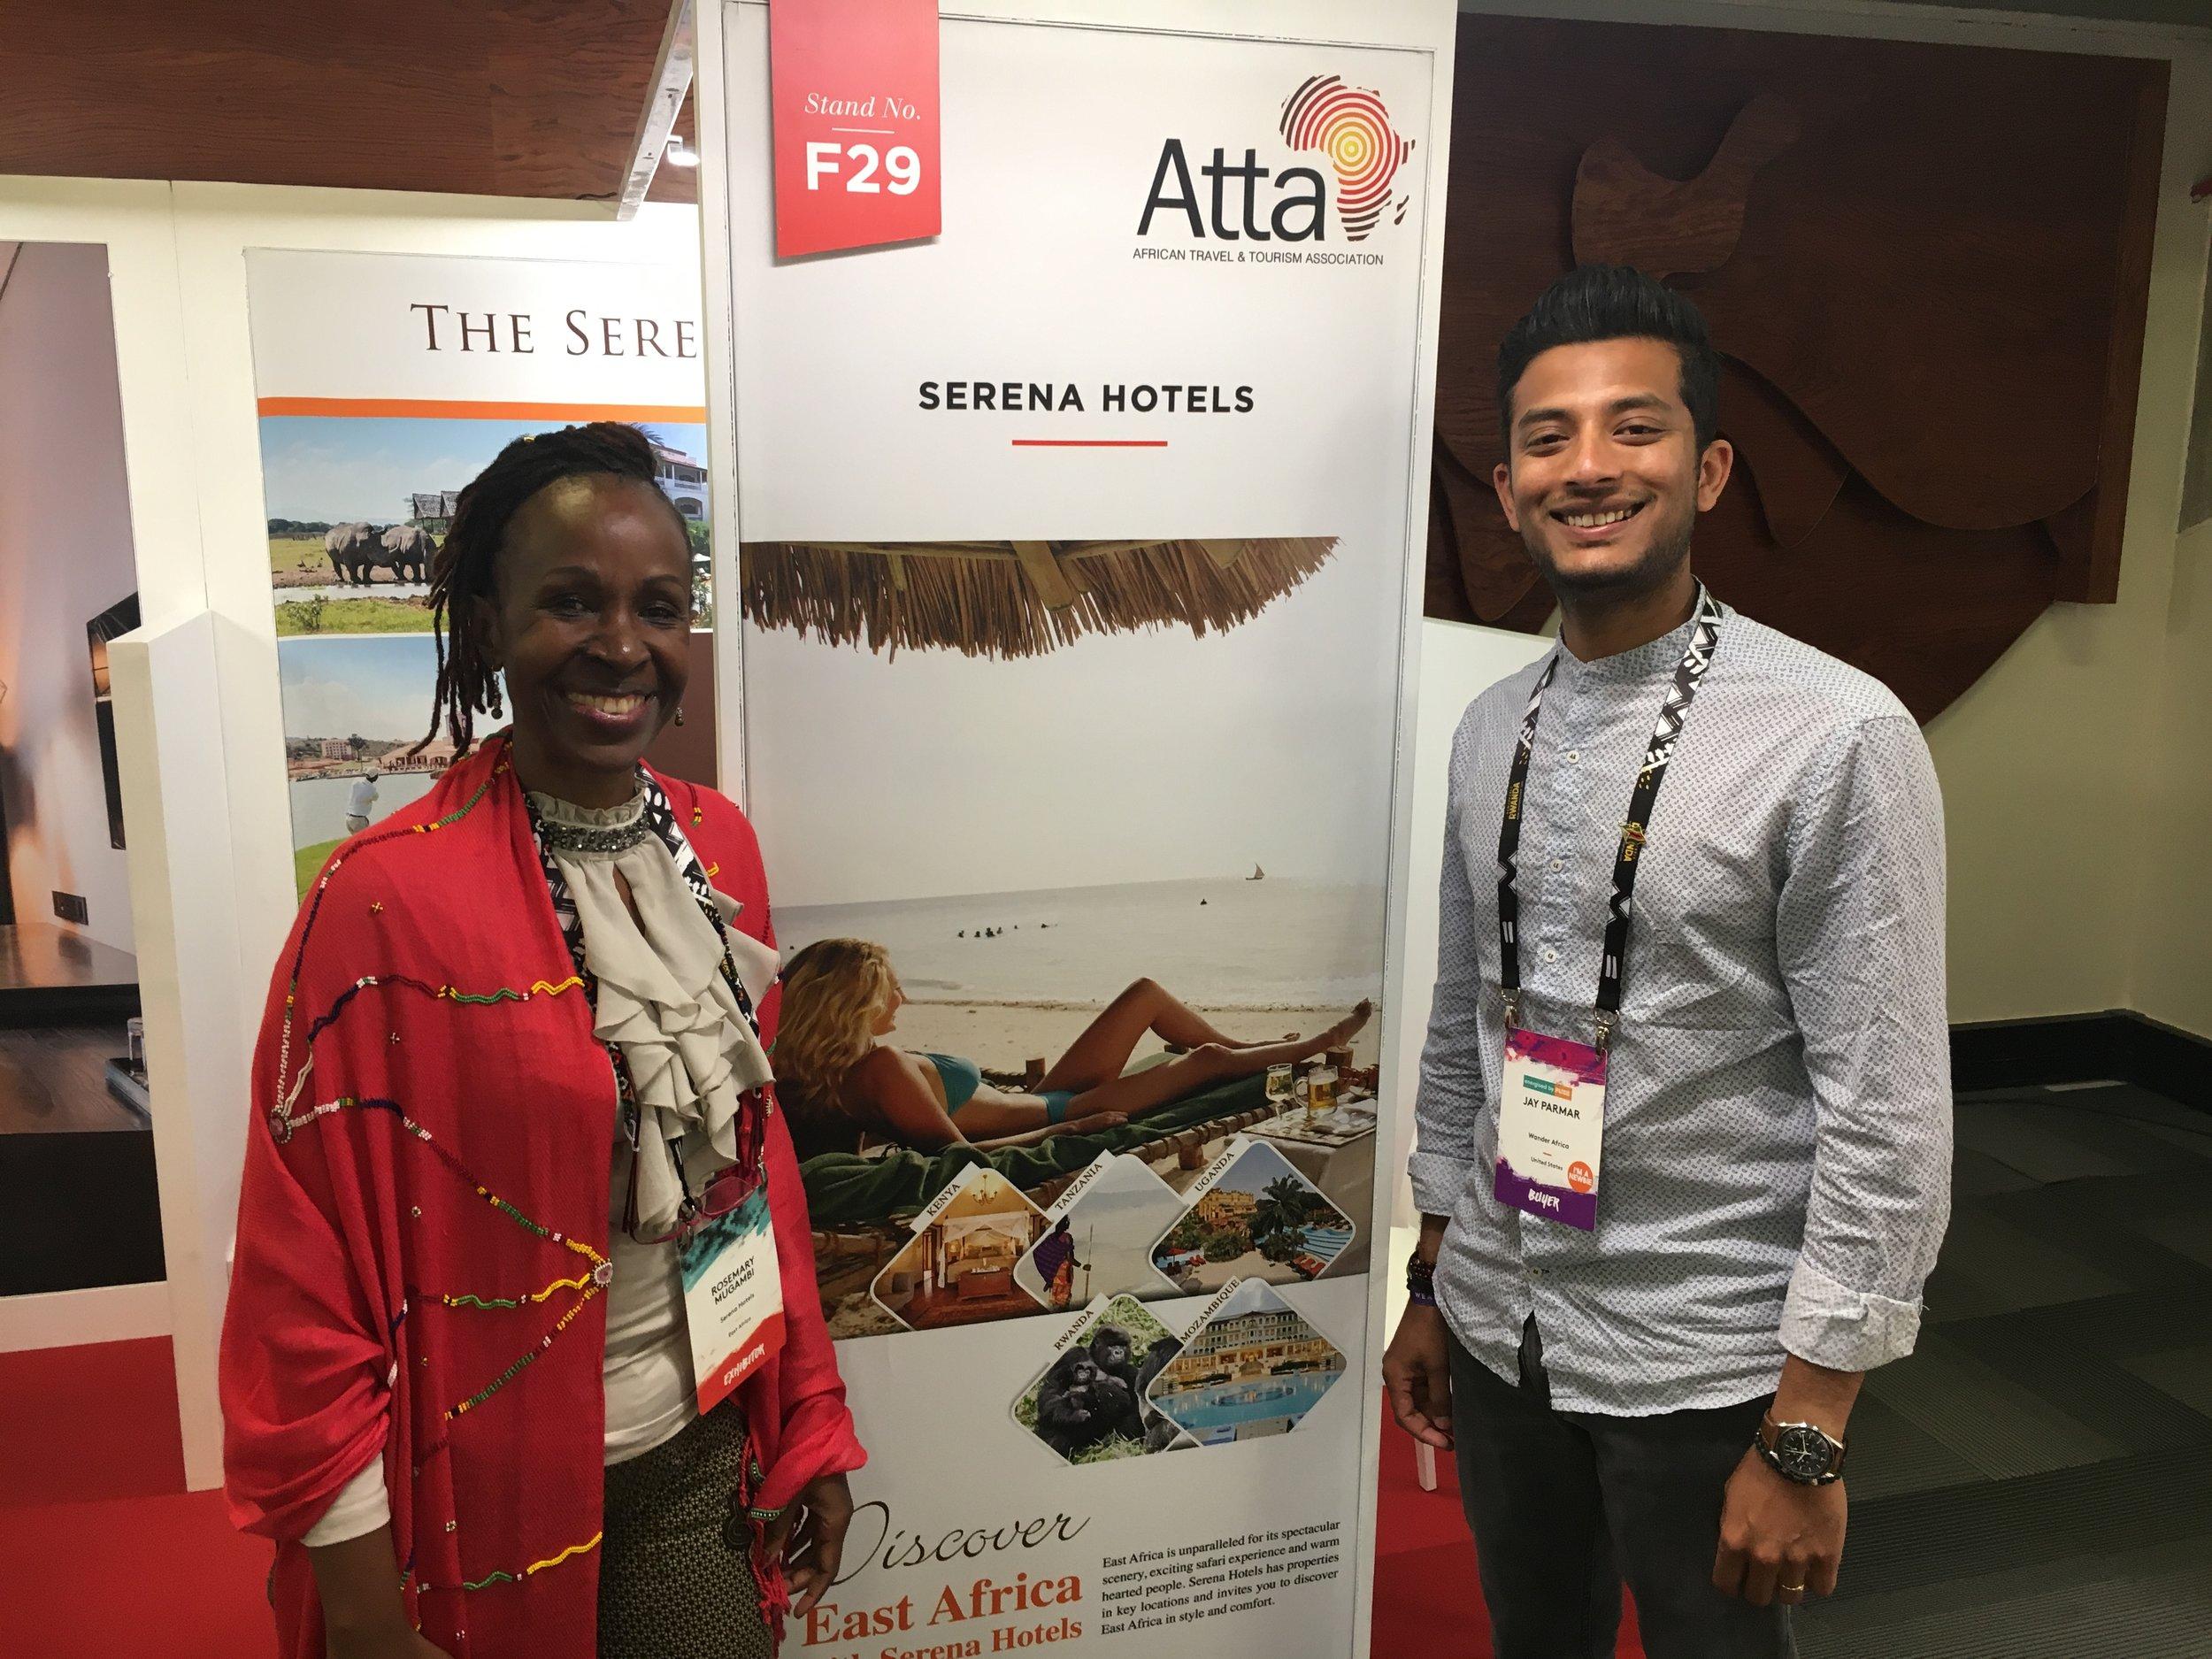 Long time friend Rosemary Mugambi, Regional Sales and Marketing Director of Serena Hotels